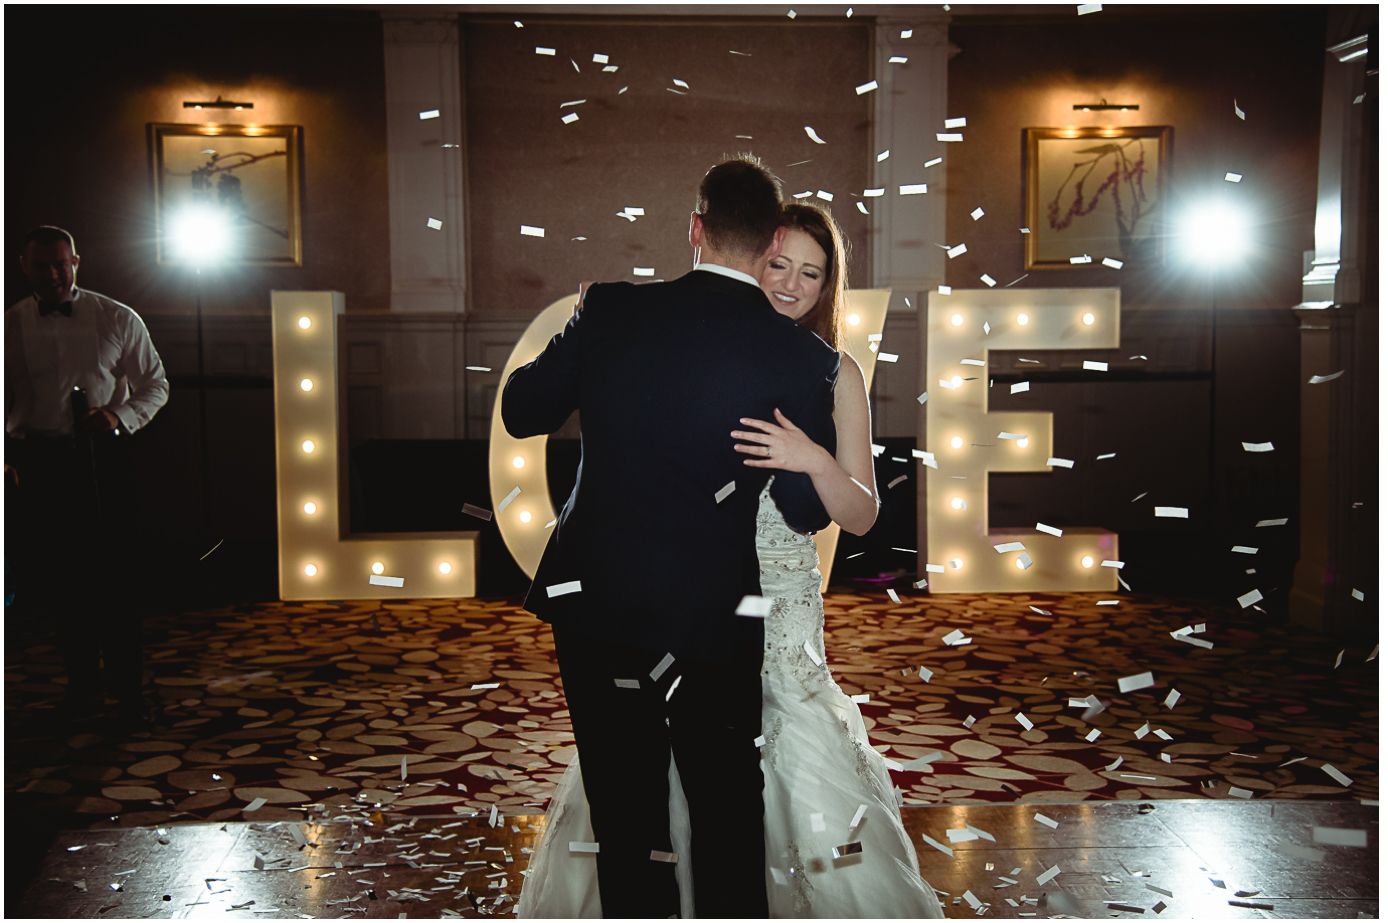 79 - Esmat and Angus - St. Ermin's Hotel London wedding photographer